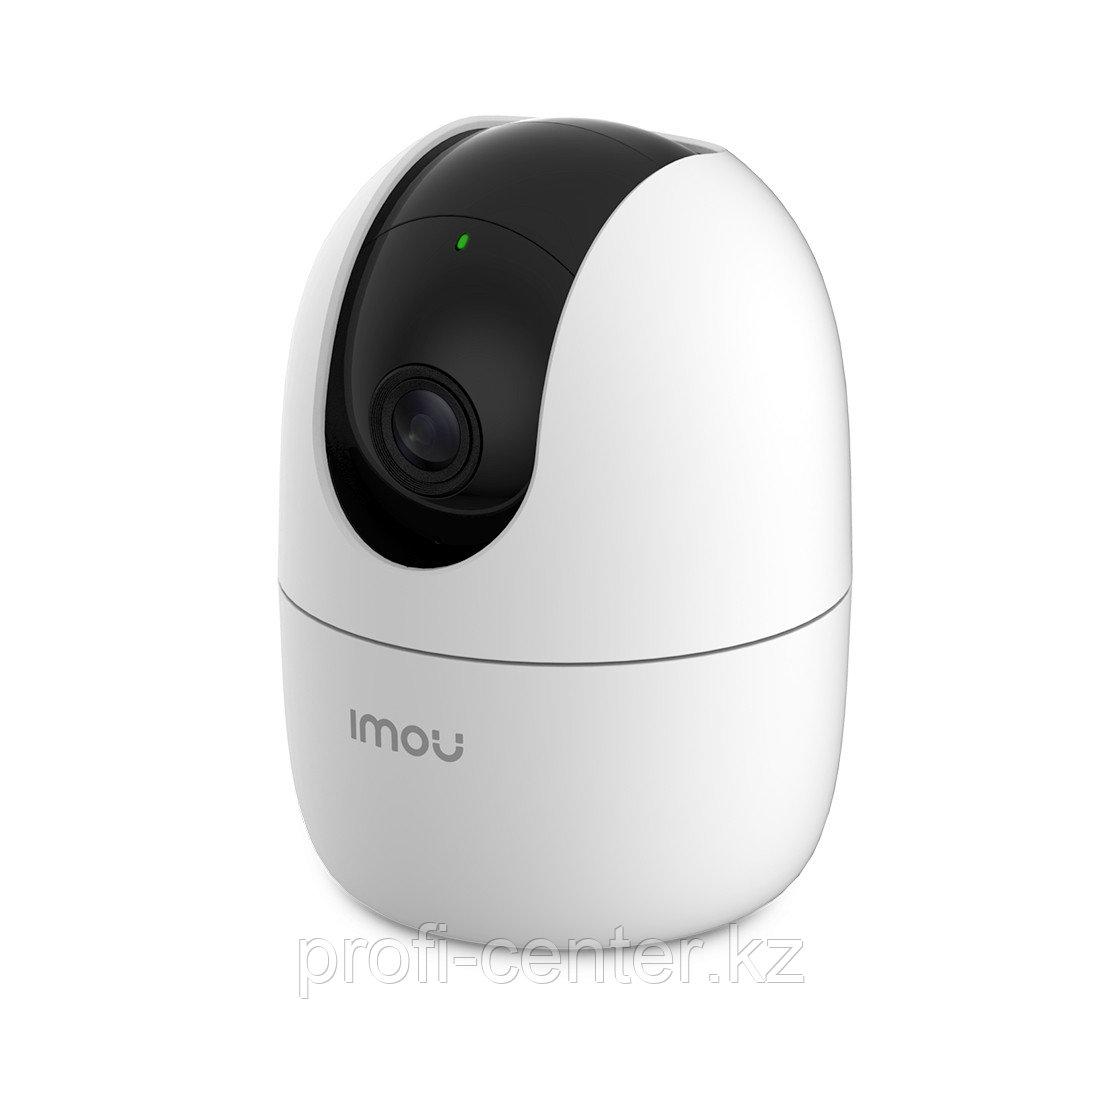 WIFI видеокамера IMOU Ranger 2